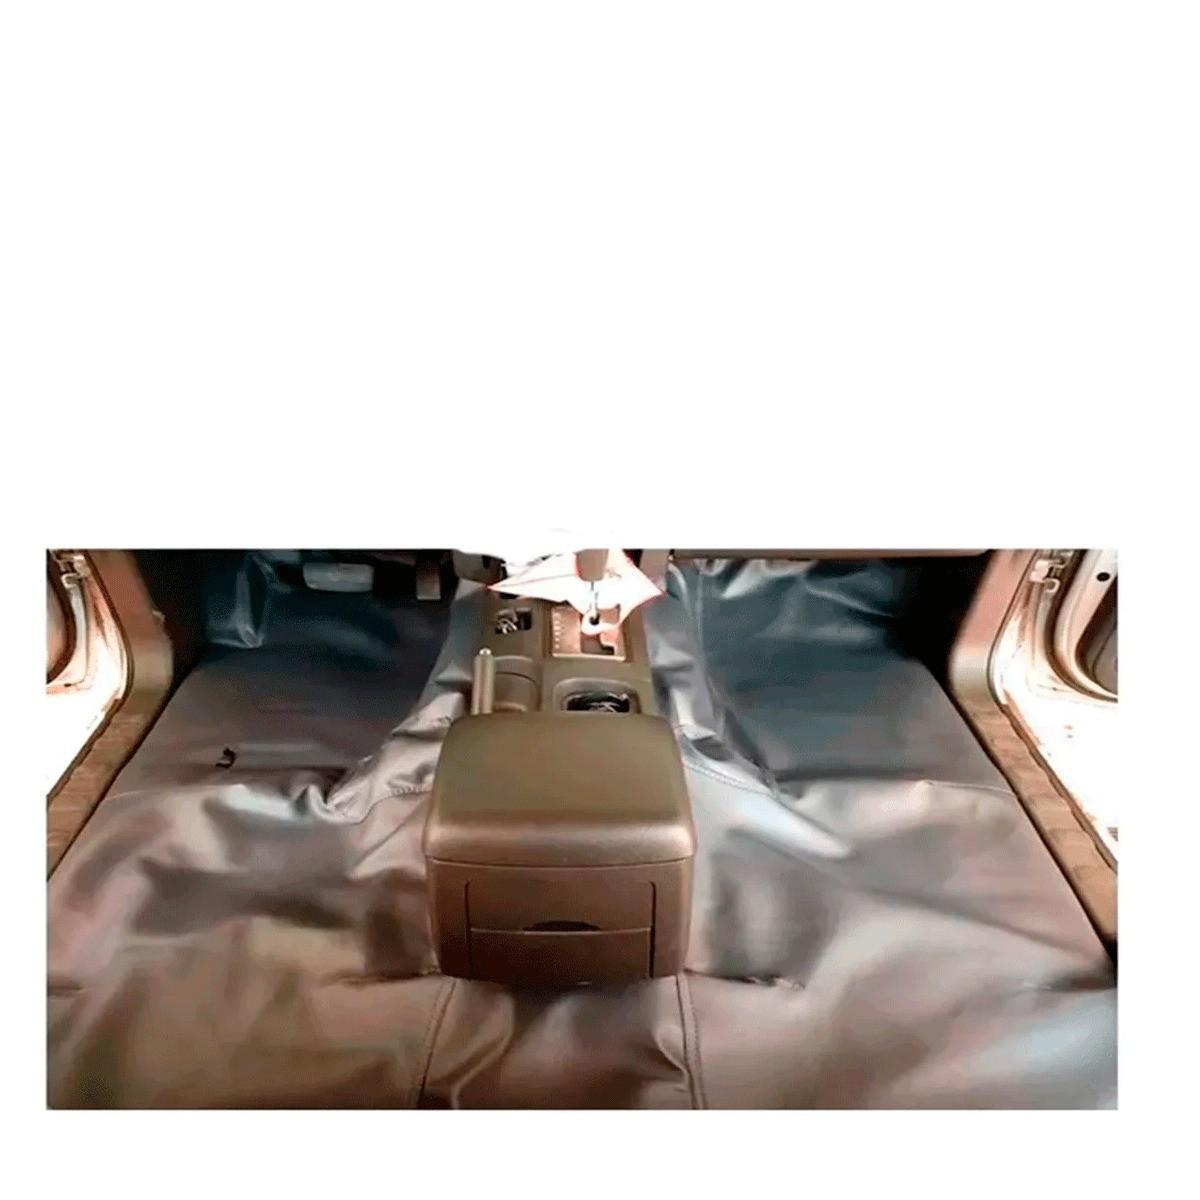 Tapete Automotivo Assoalho Emborrachado Bidim Fiat Punto 2007 a 2018